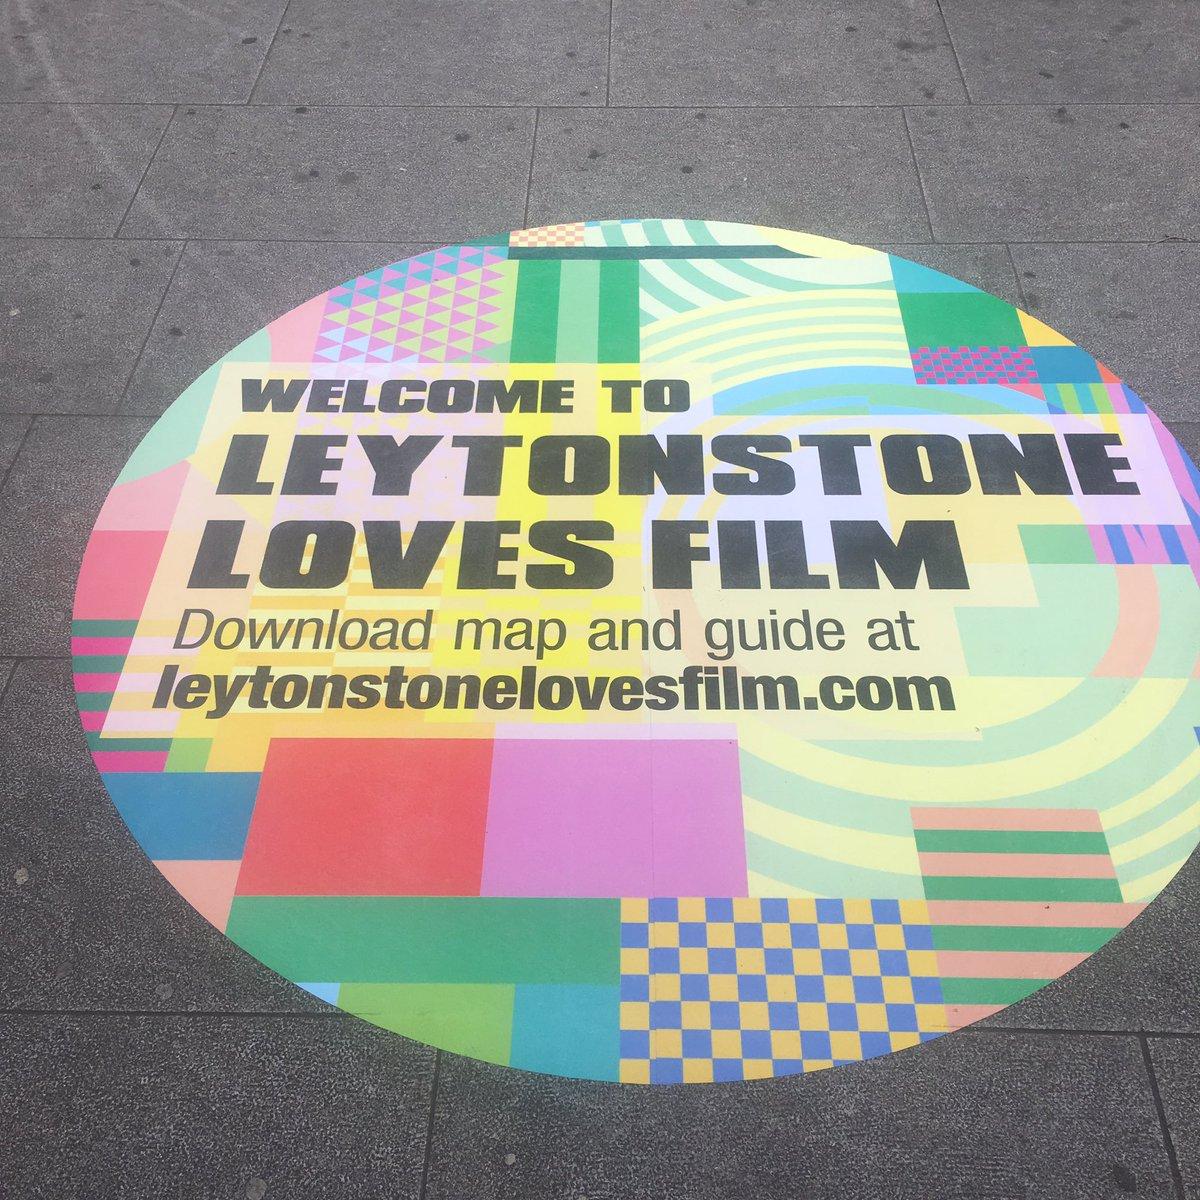 Anything happening this weekend? Leytonstone tube commuters #FOMO #leytonstonelovesfilm #OpeningNight